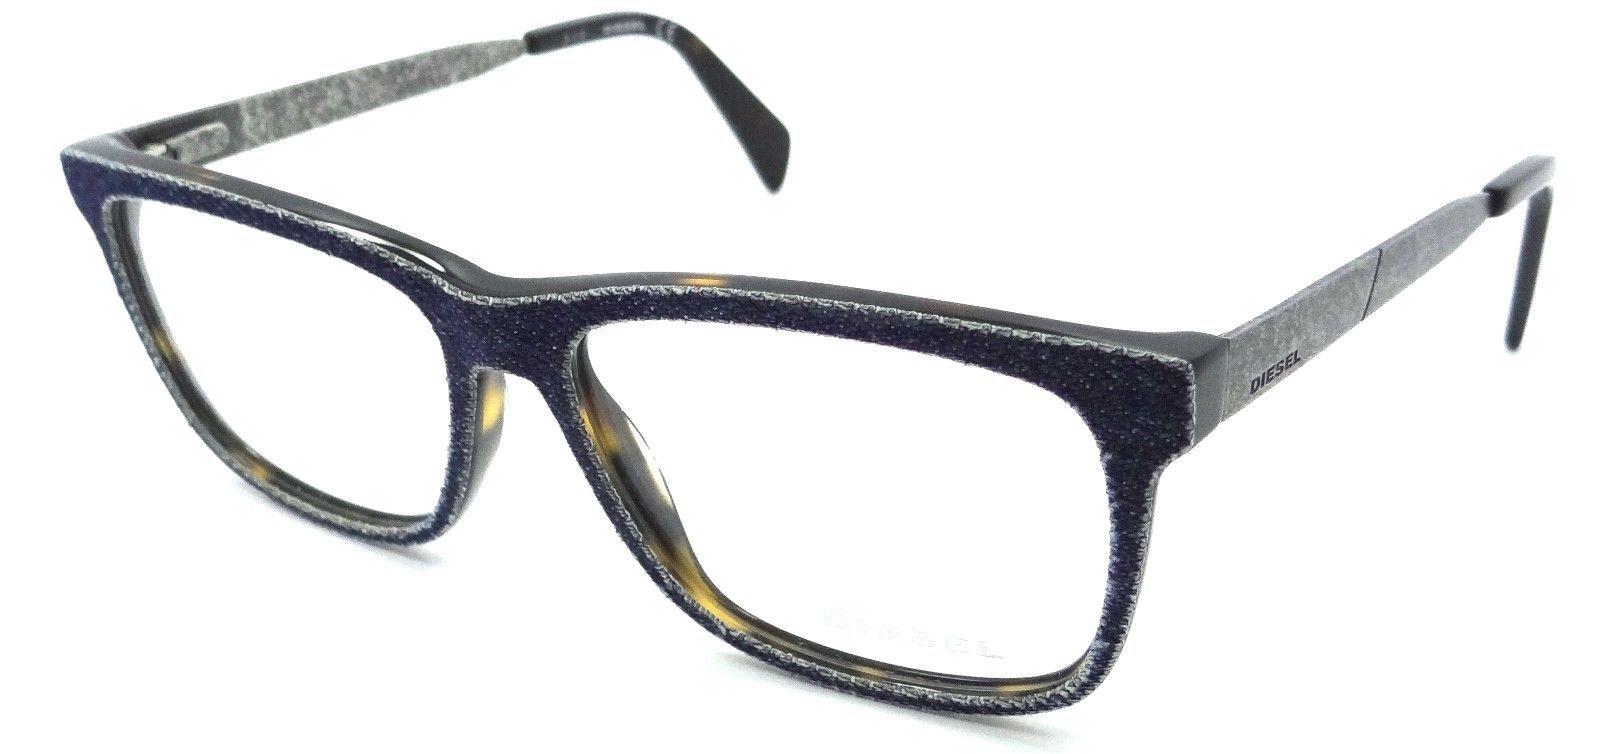 e78cbff6b2 Diesel Rx Eyeglasses Frames DL5161 055 and 50 similar items. S l1600